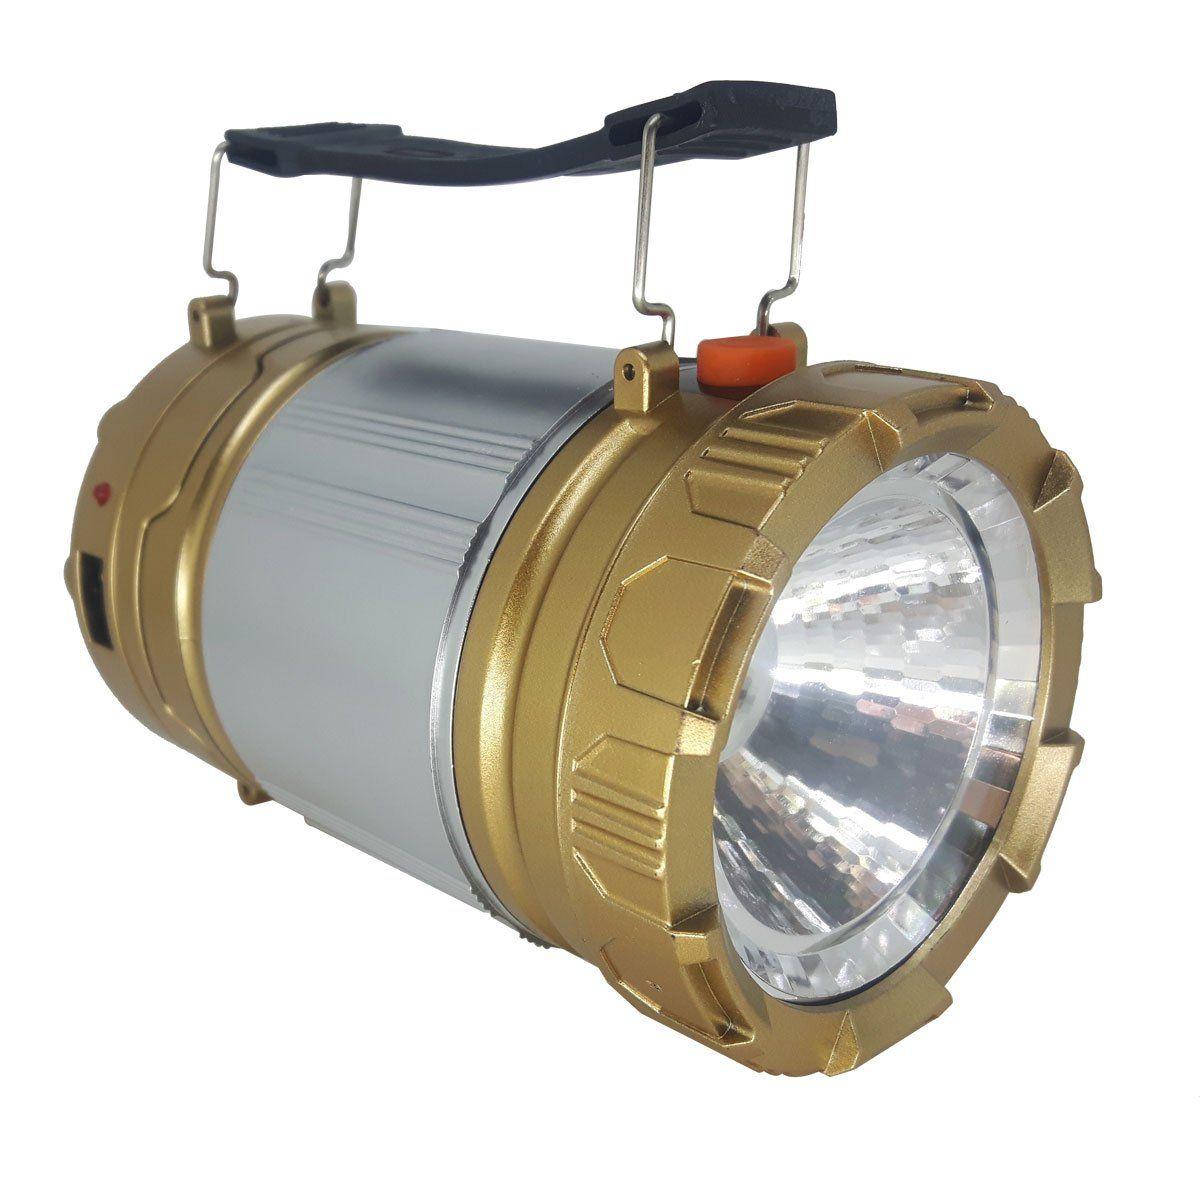 Lanterna Manual Lampião KT611 Dourada